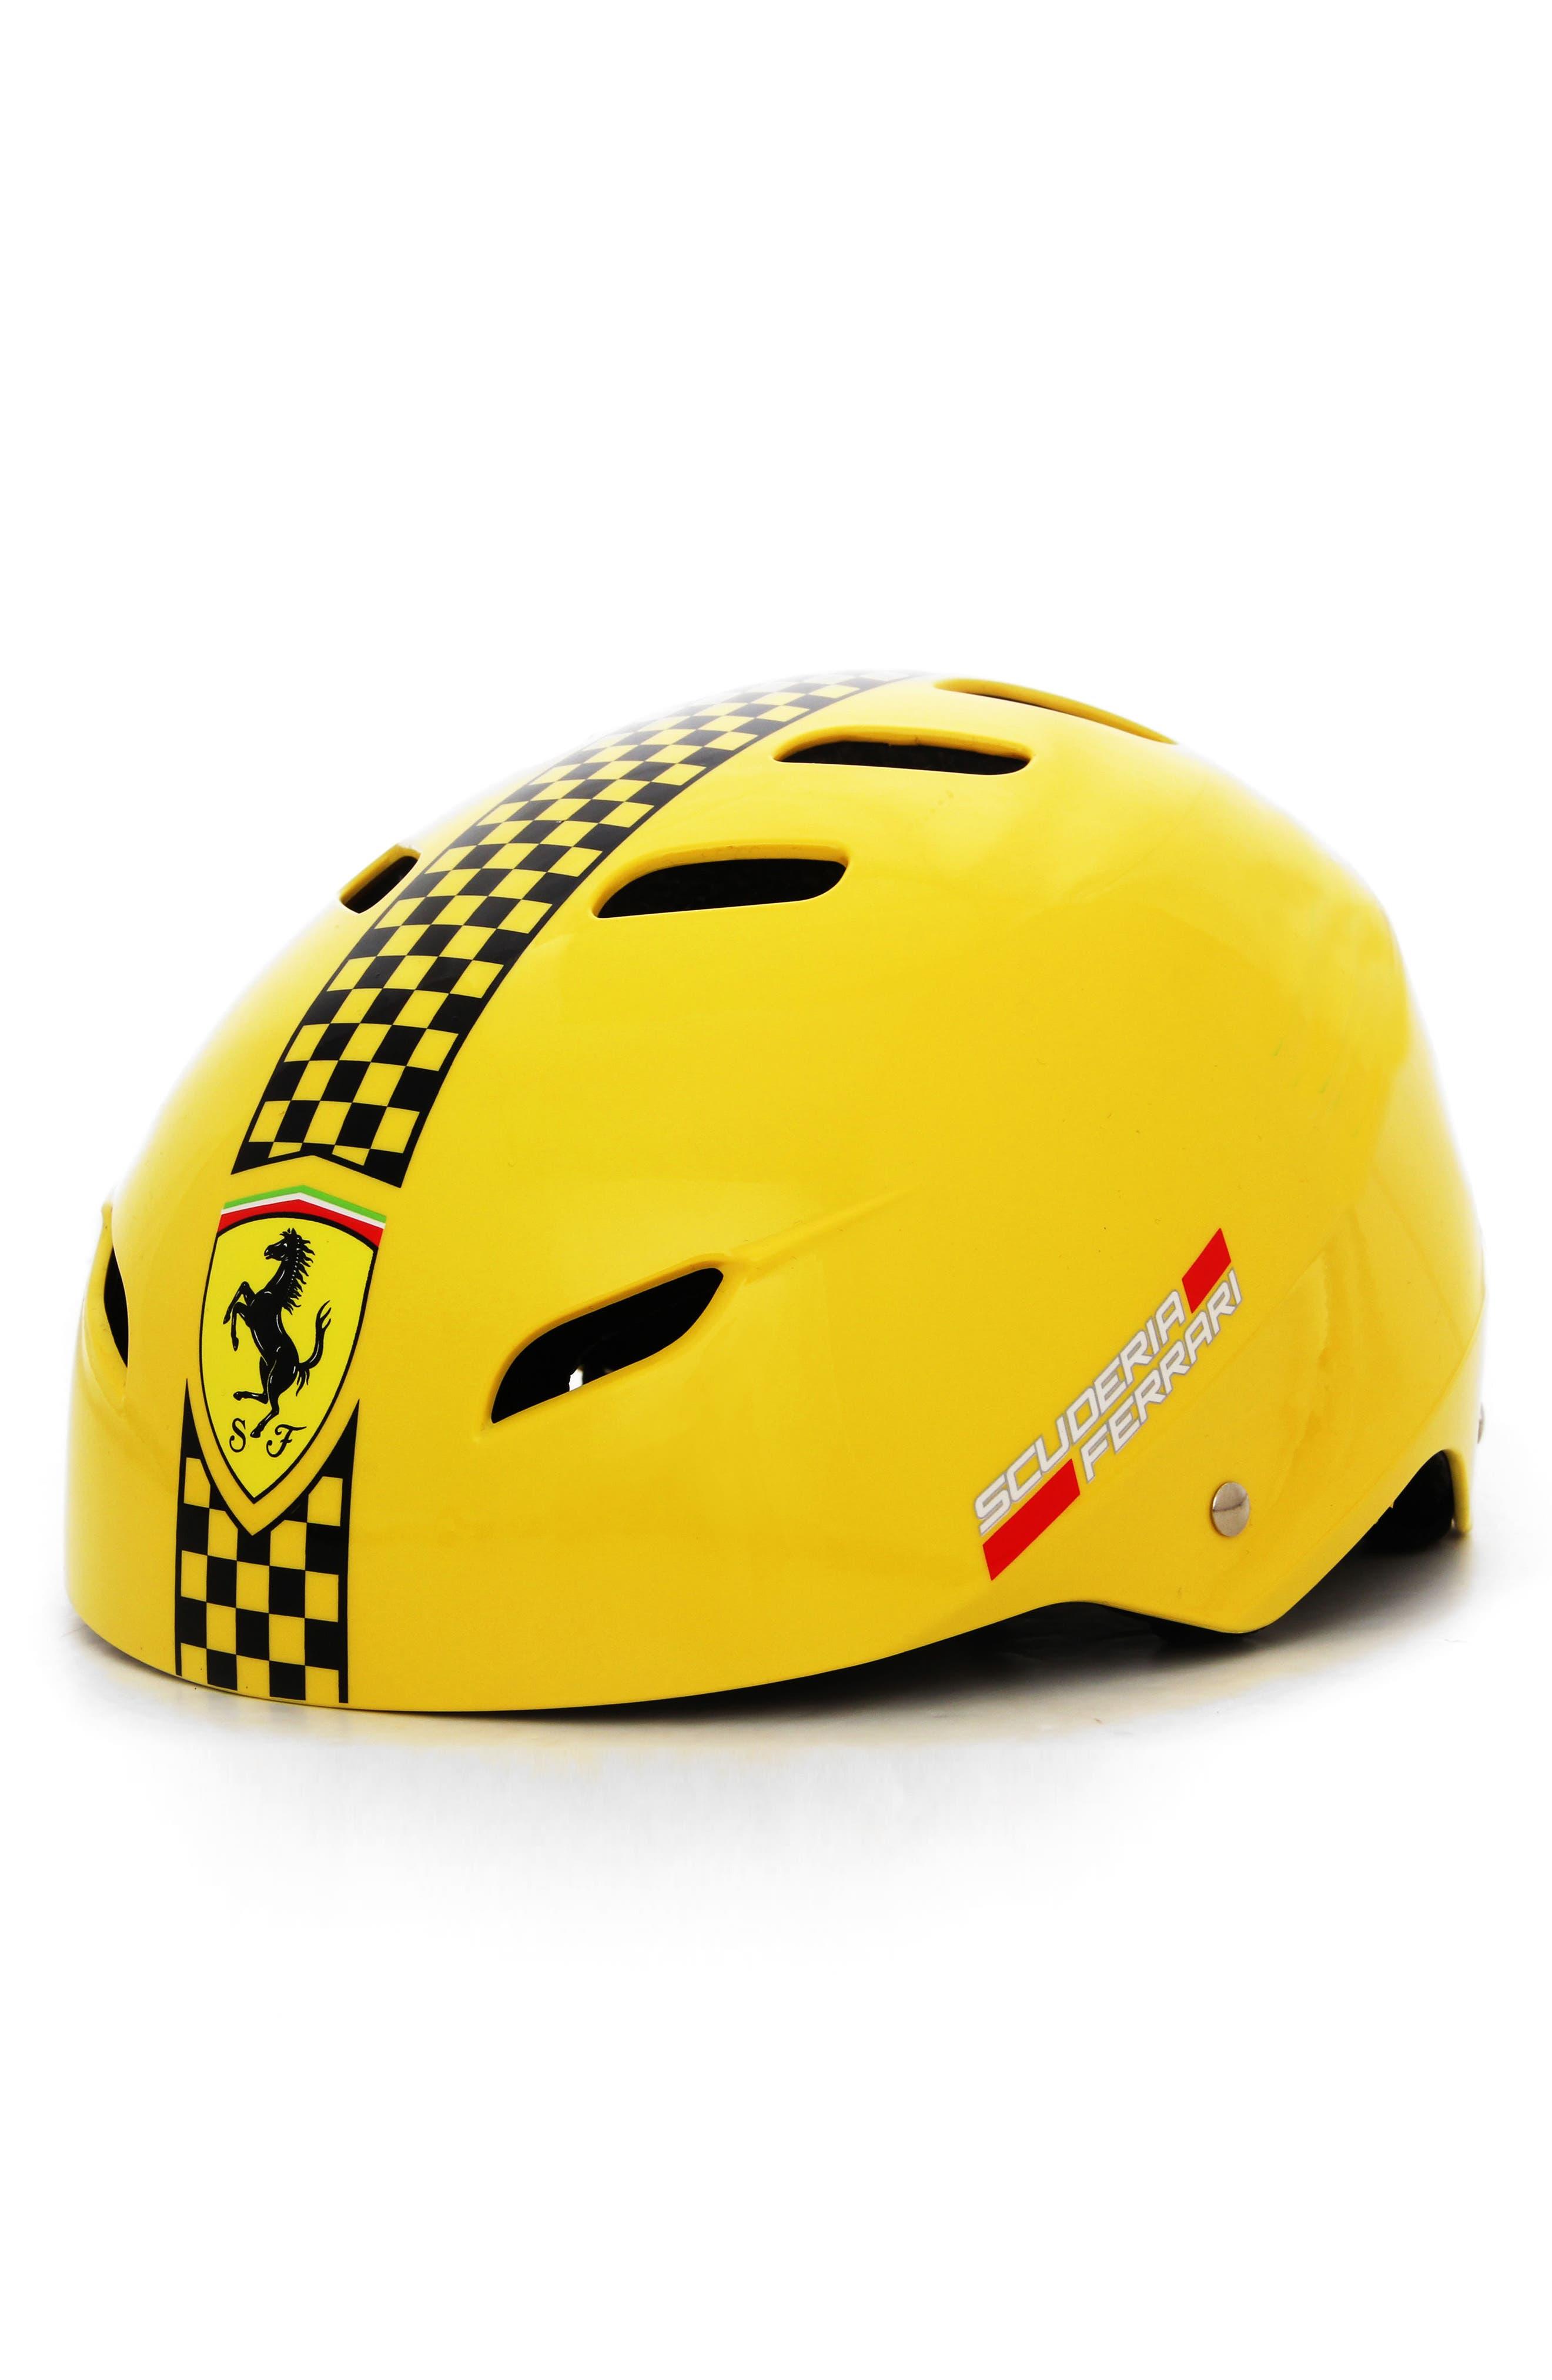 F1 Racing Helmet,                             Alternate thumbnail 2, color,                             YELLOW